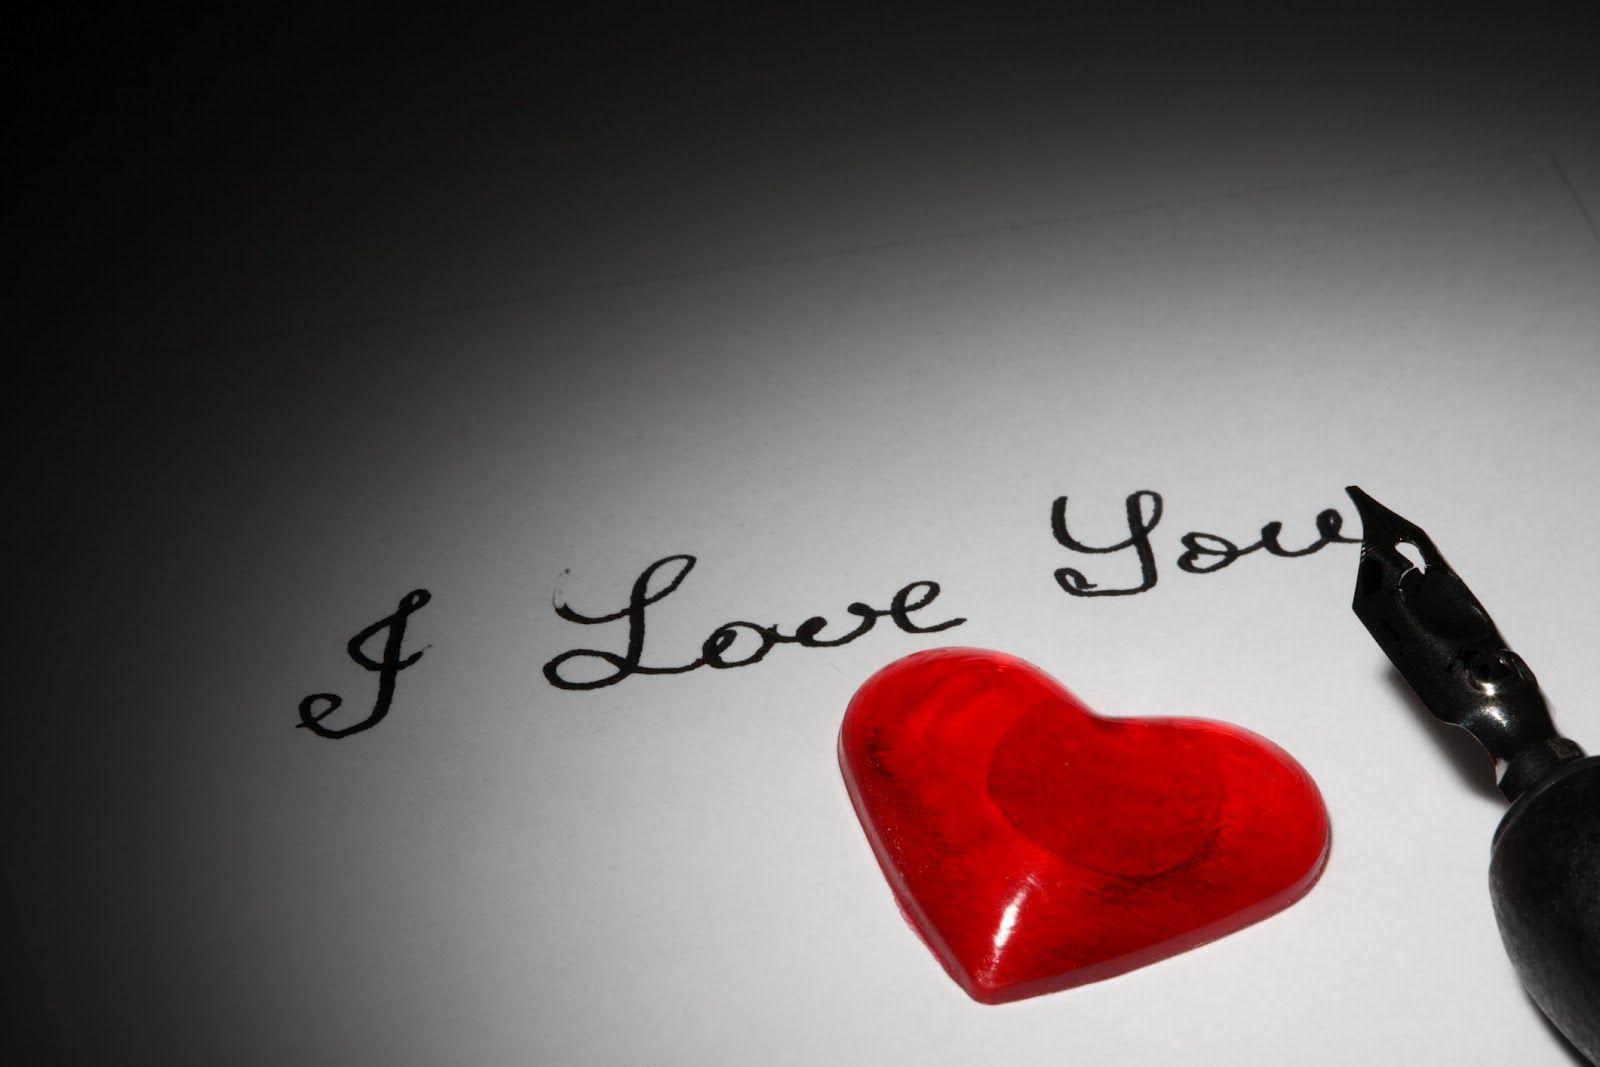 tải ảnh i love you HD